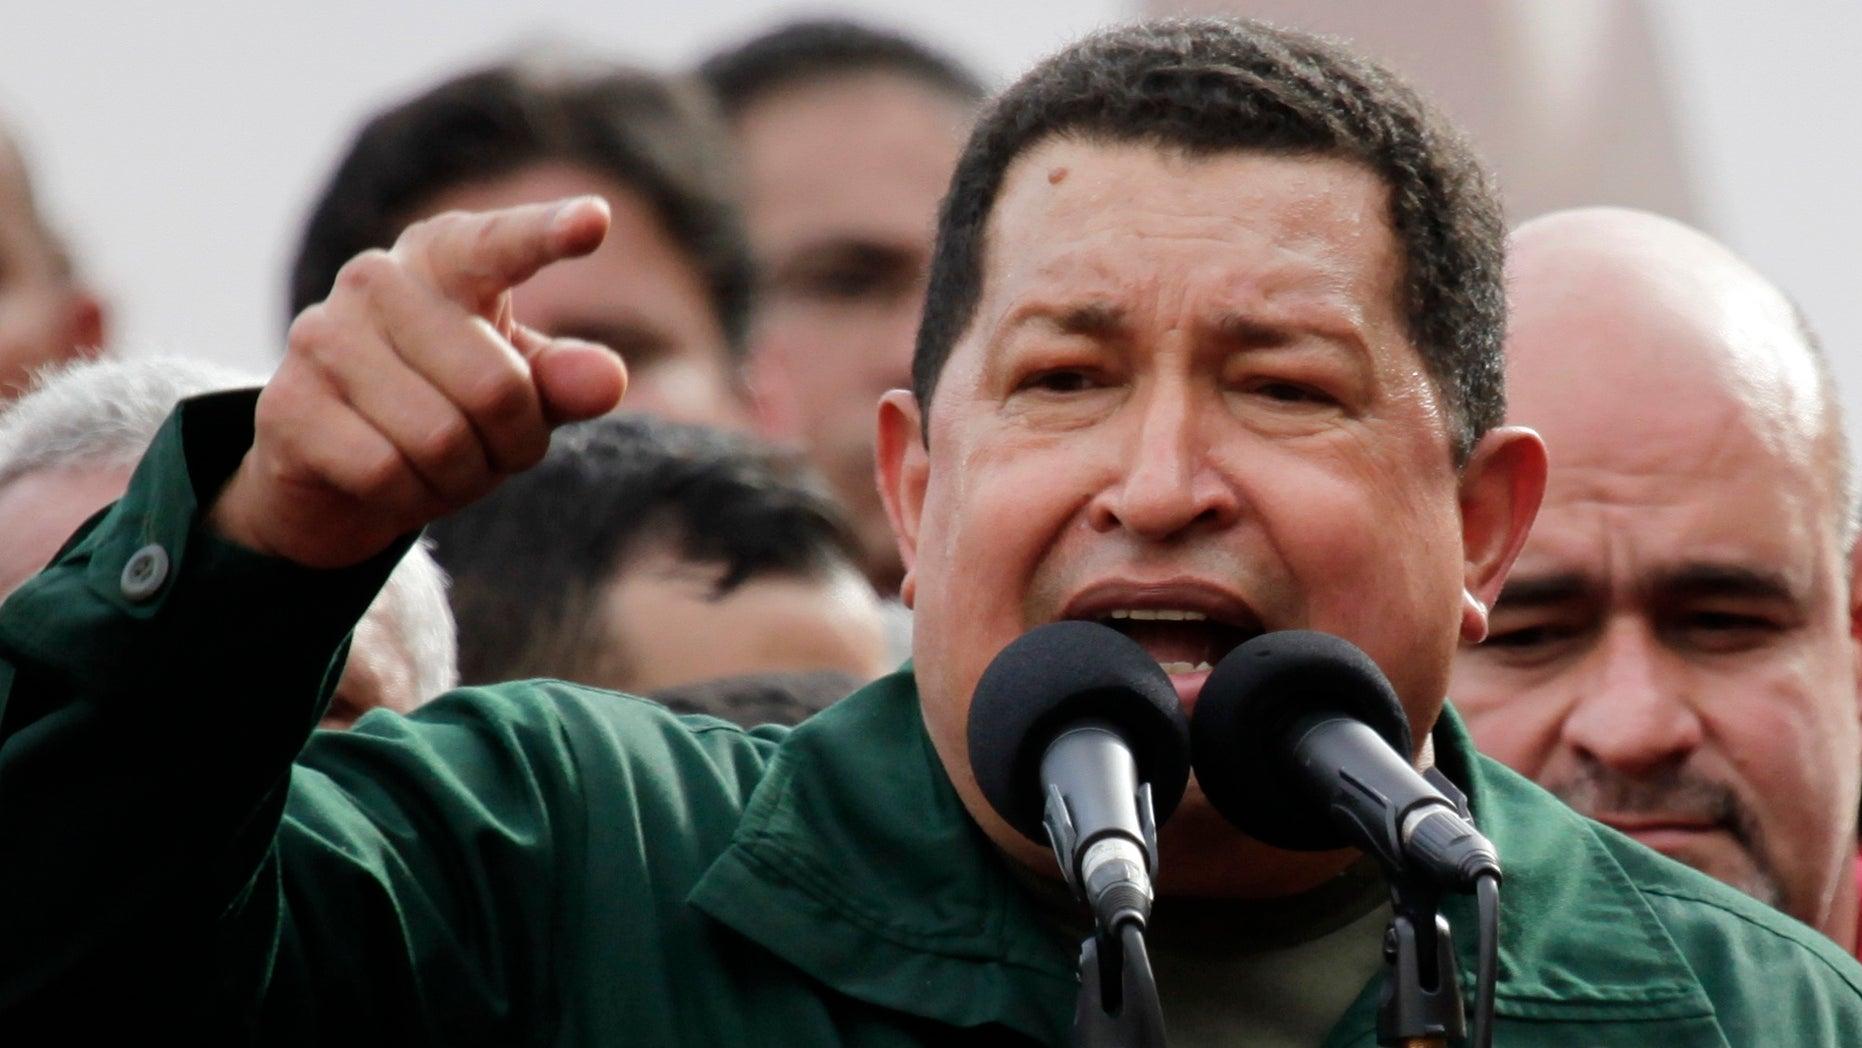 Jan. 5: Venezuela's President Hugo Chavez speaks to supporters at a square in Caracas, Venezuela.